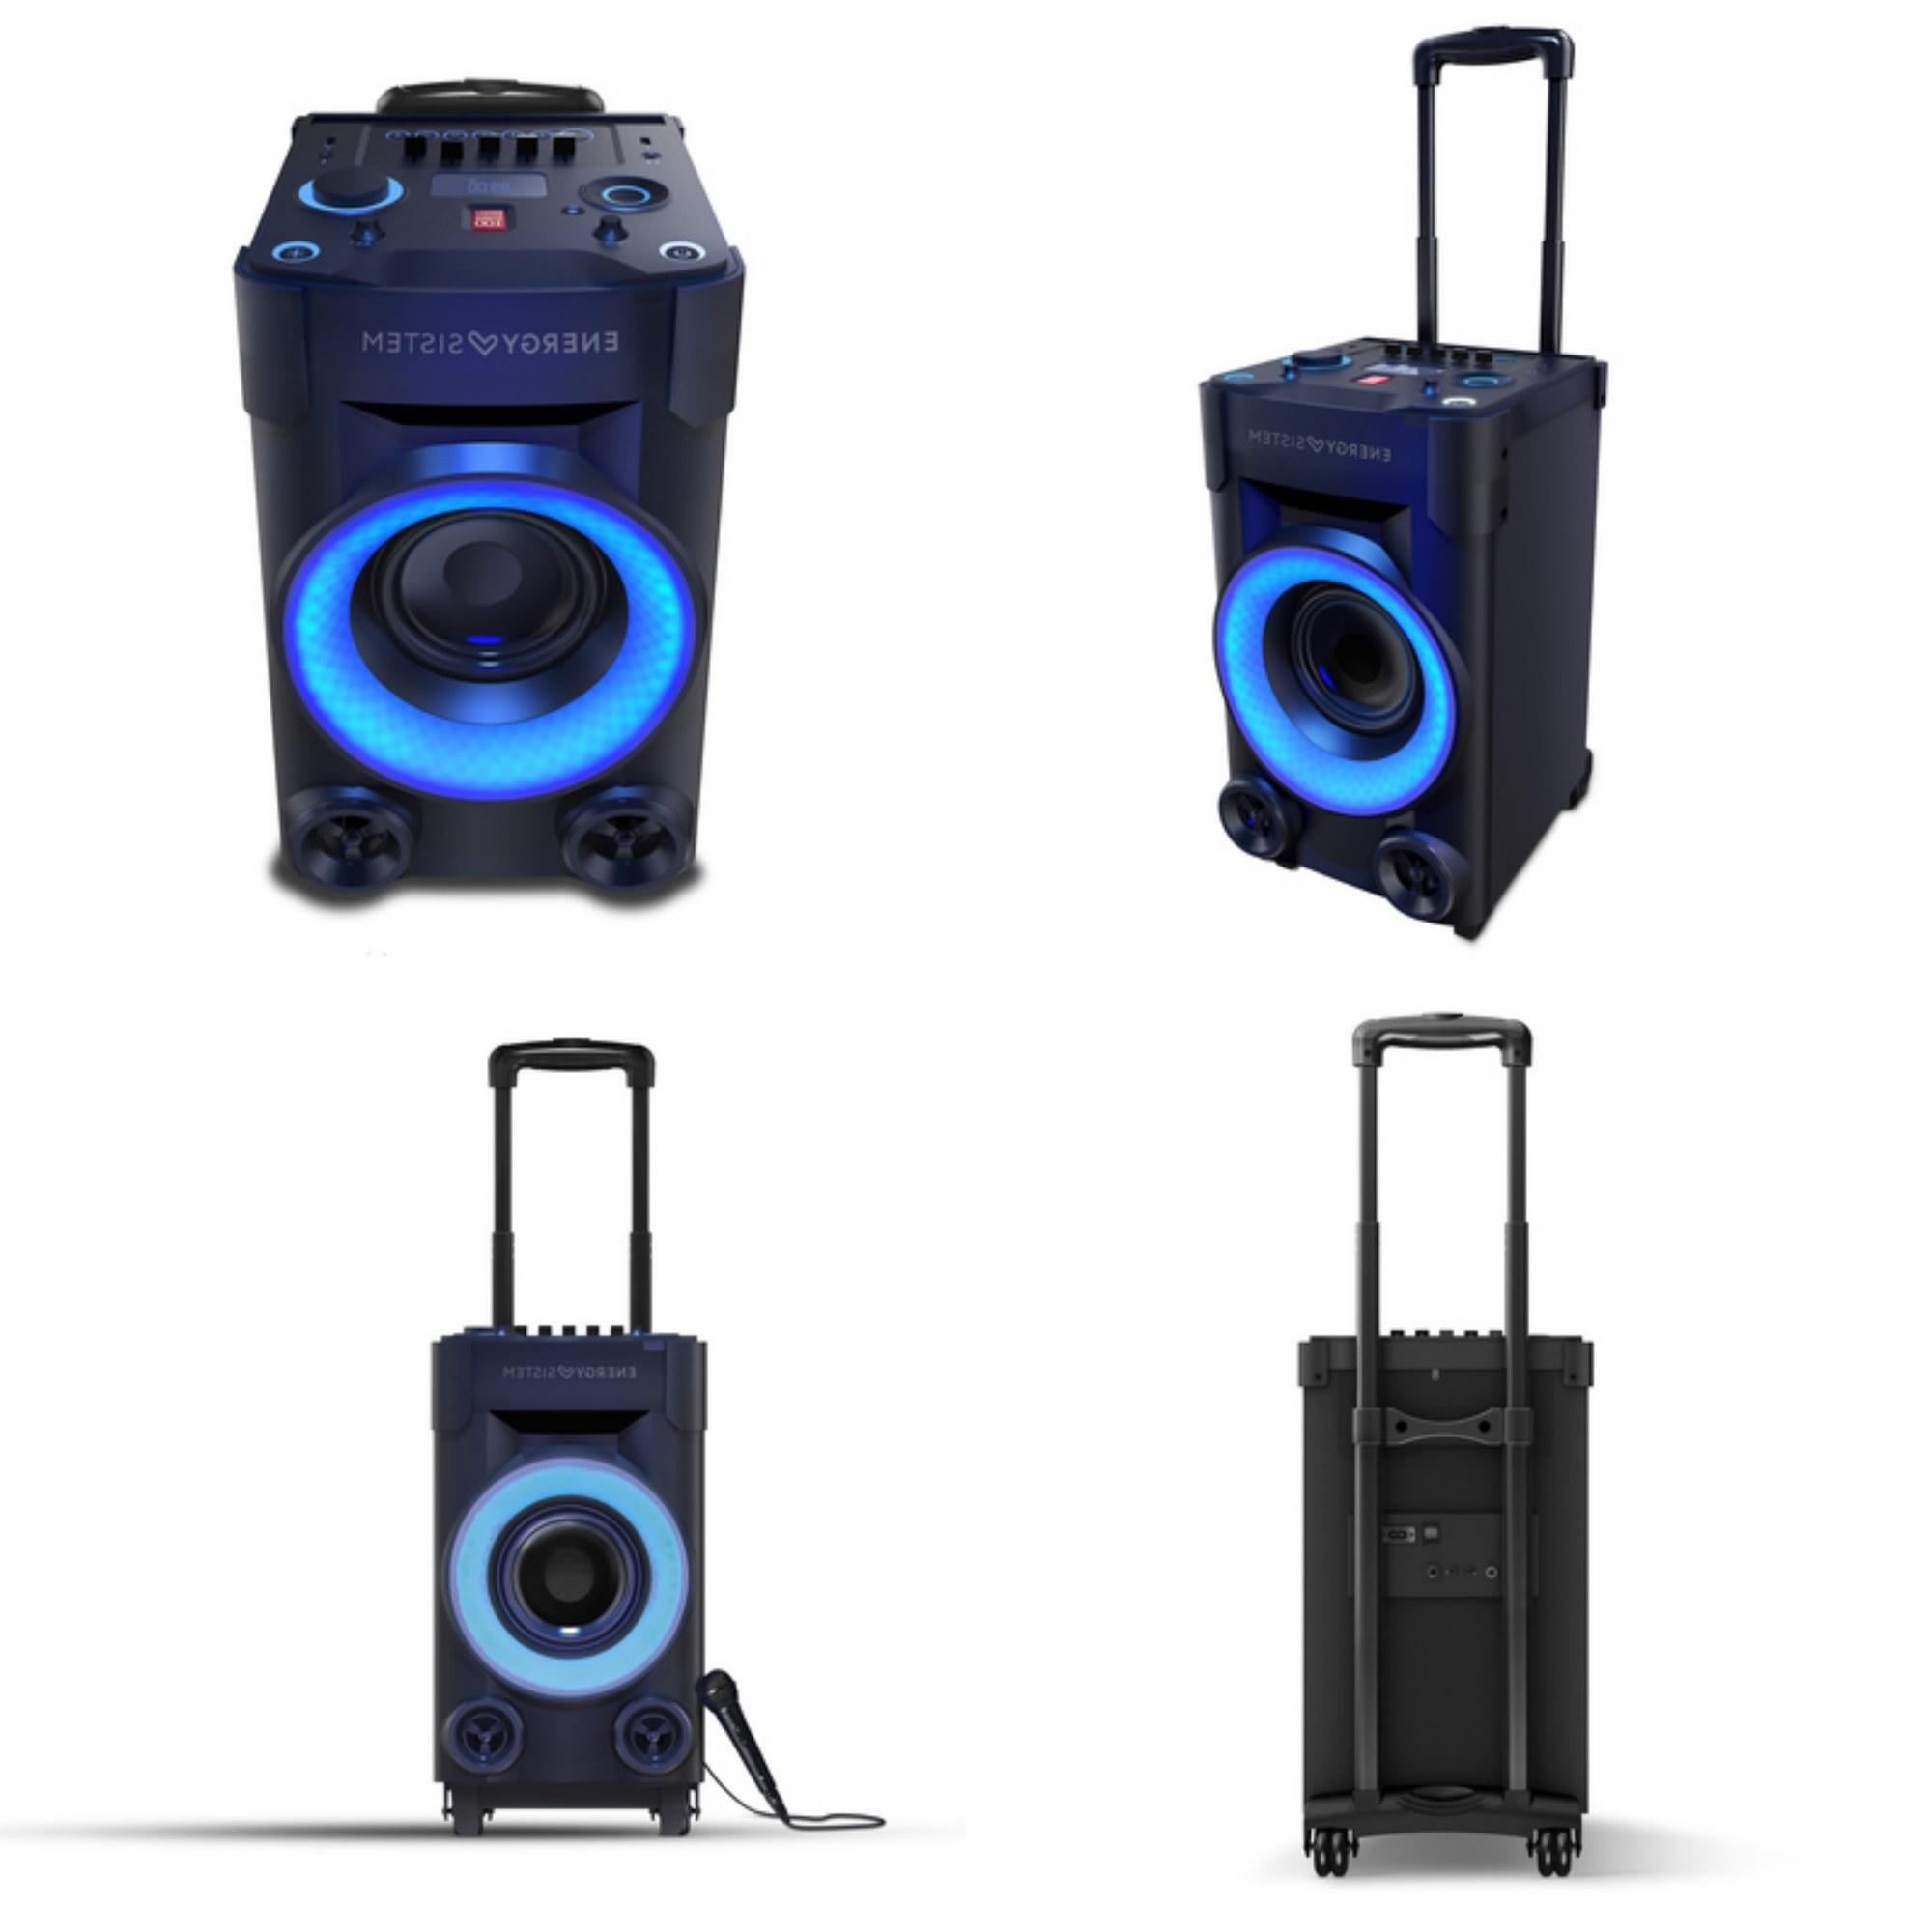 Altavoz Portatil Mndw Energy Party 3 Go Un Altavoz Portà Til Con Karaoke Perfecto Para